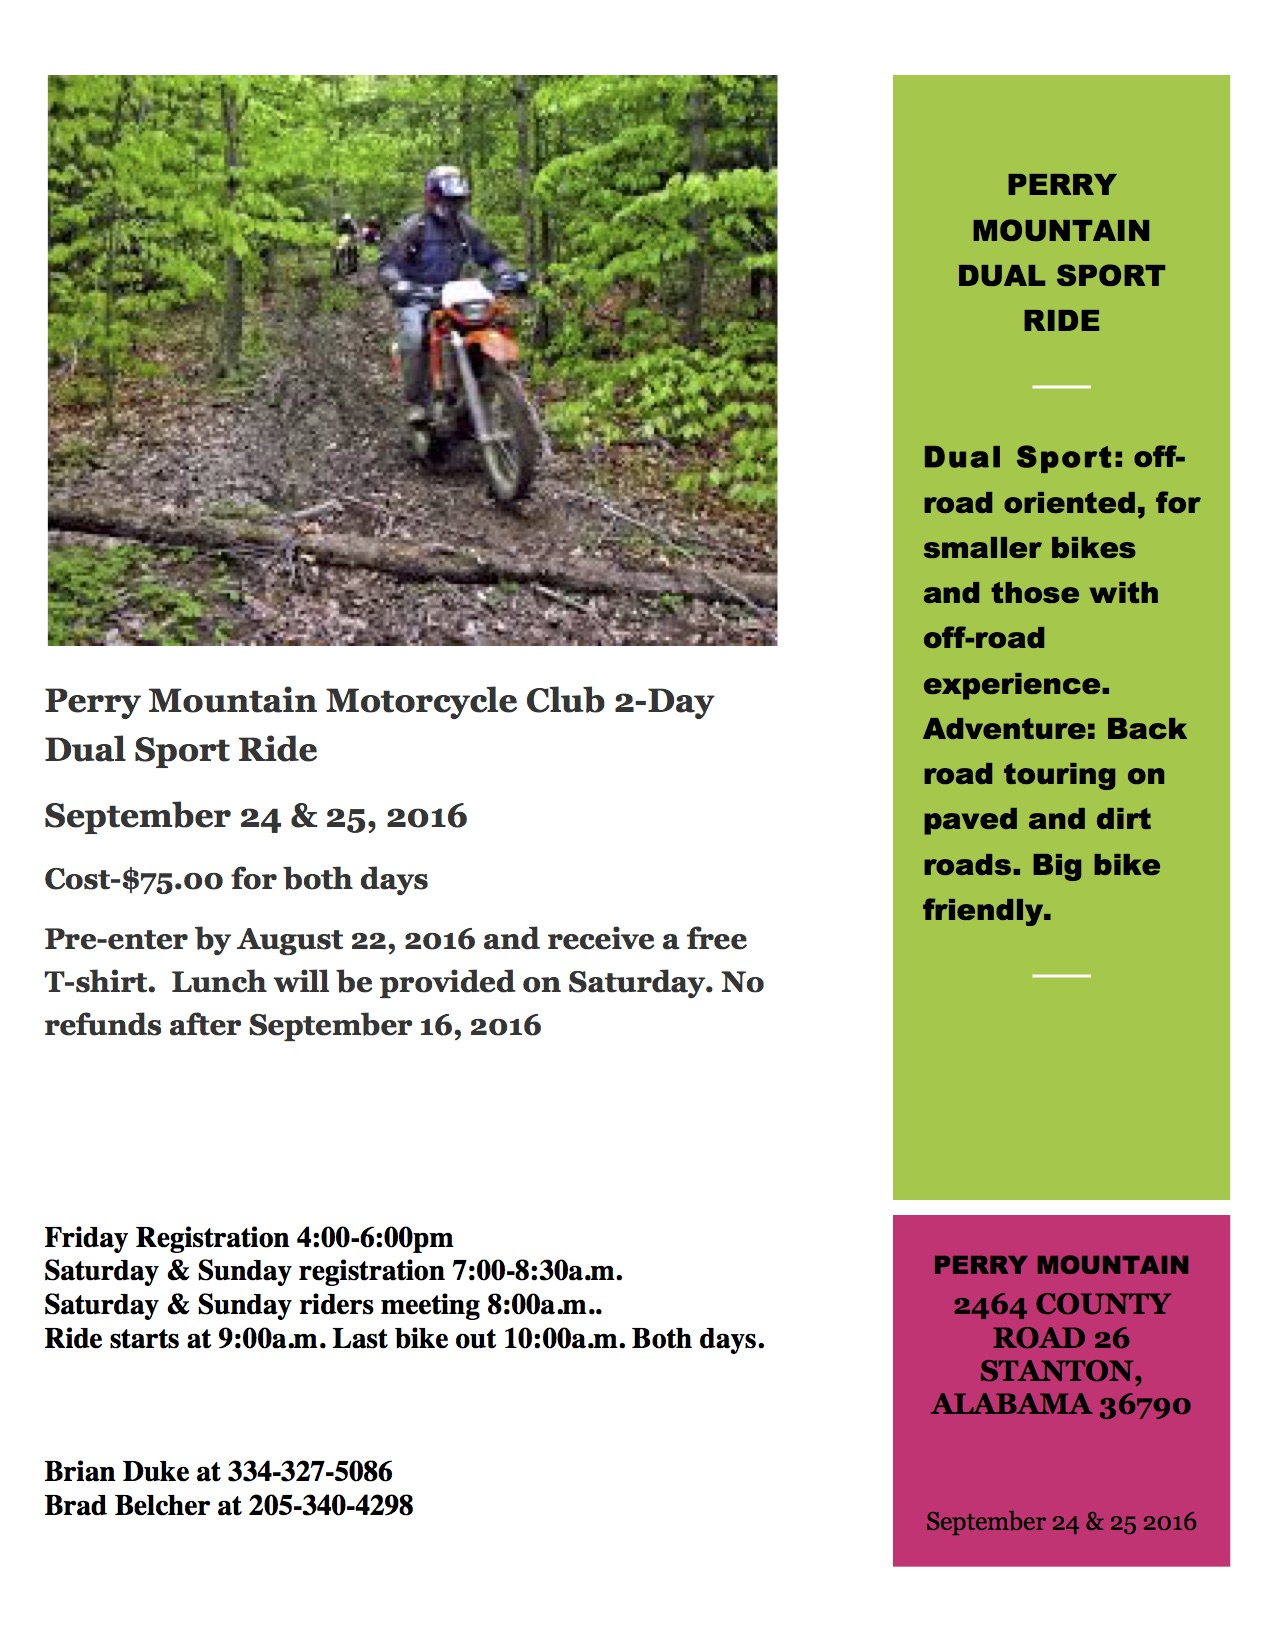 Perry Mtn dual sport flyer 2016.jpg